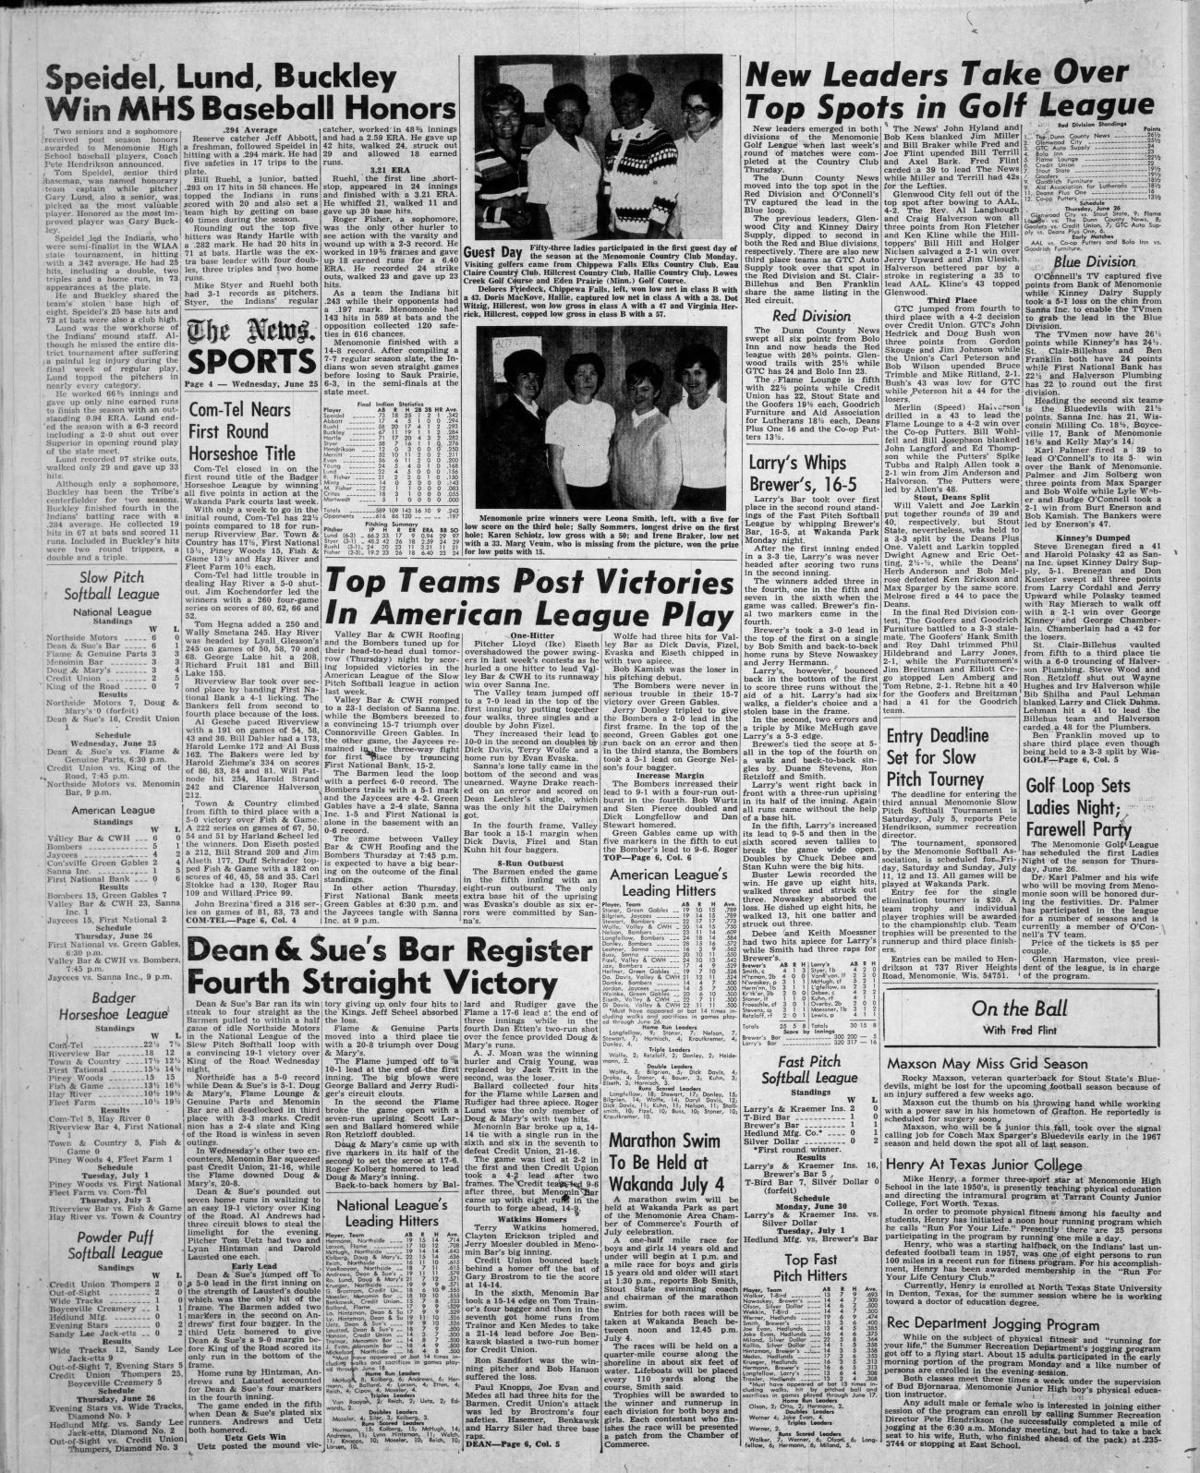 The_Dunn_County_News_Wed__Jun_25__1969